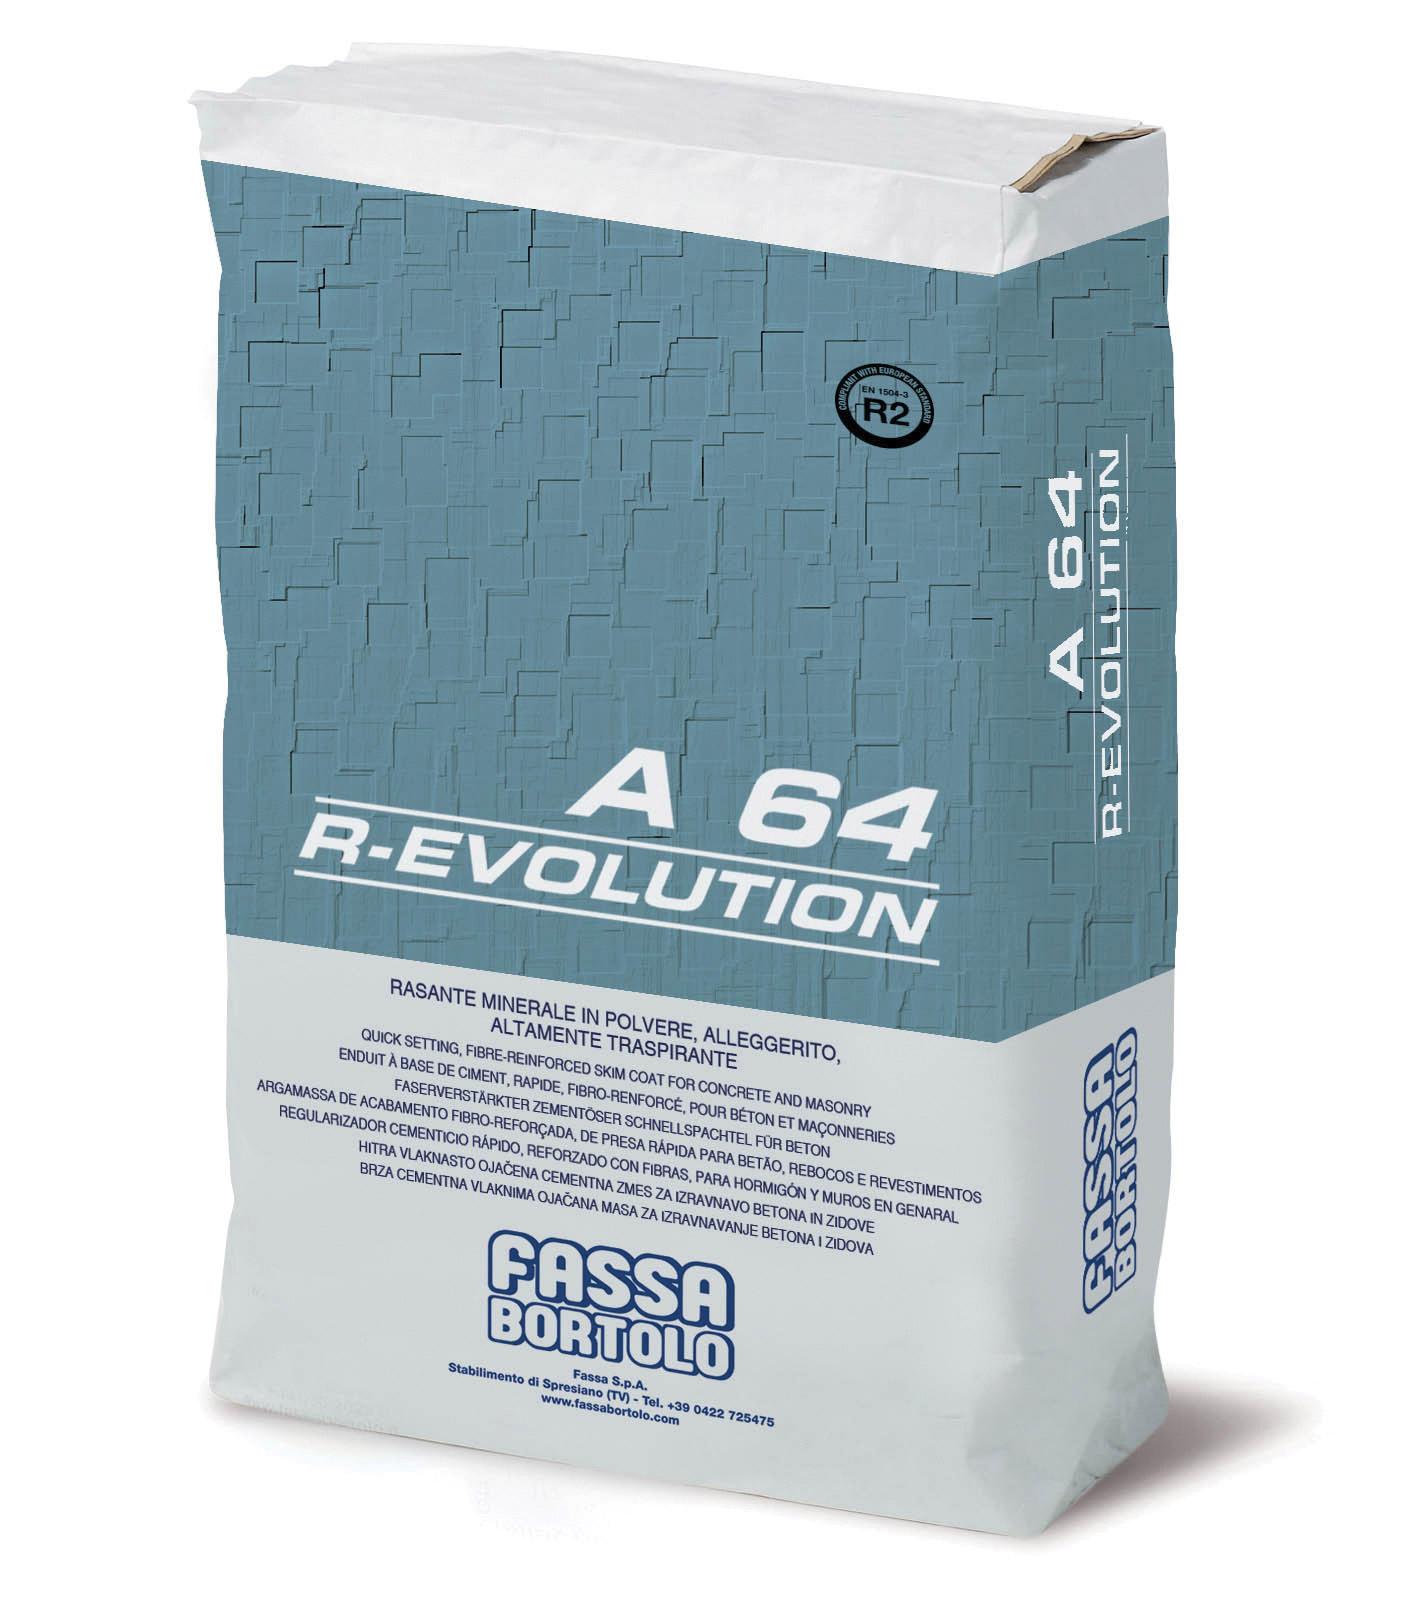 A 64 R-EVOLUTION